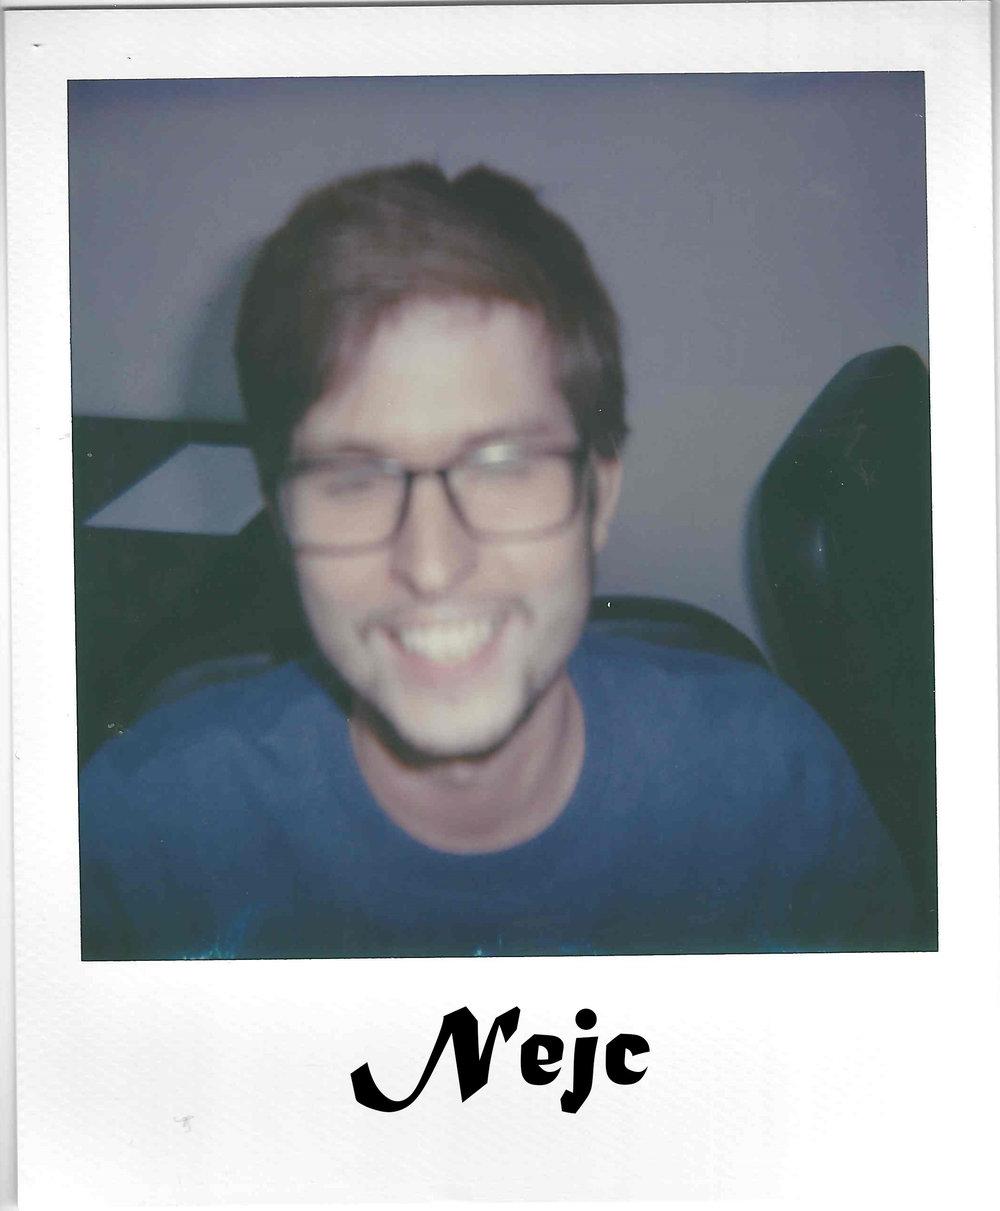 Polaroid_Nejc.jpg